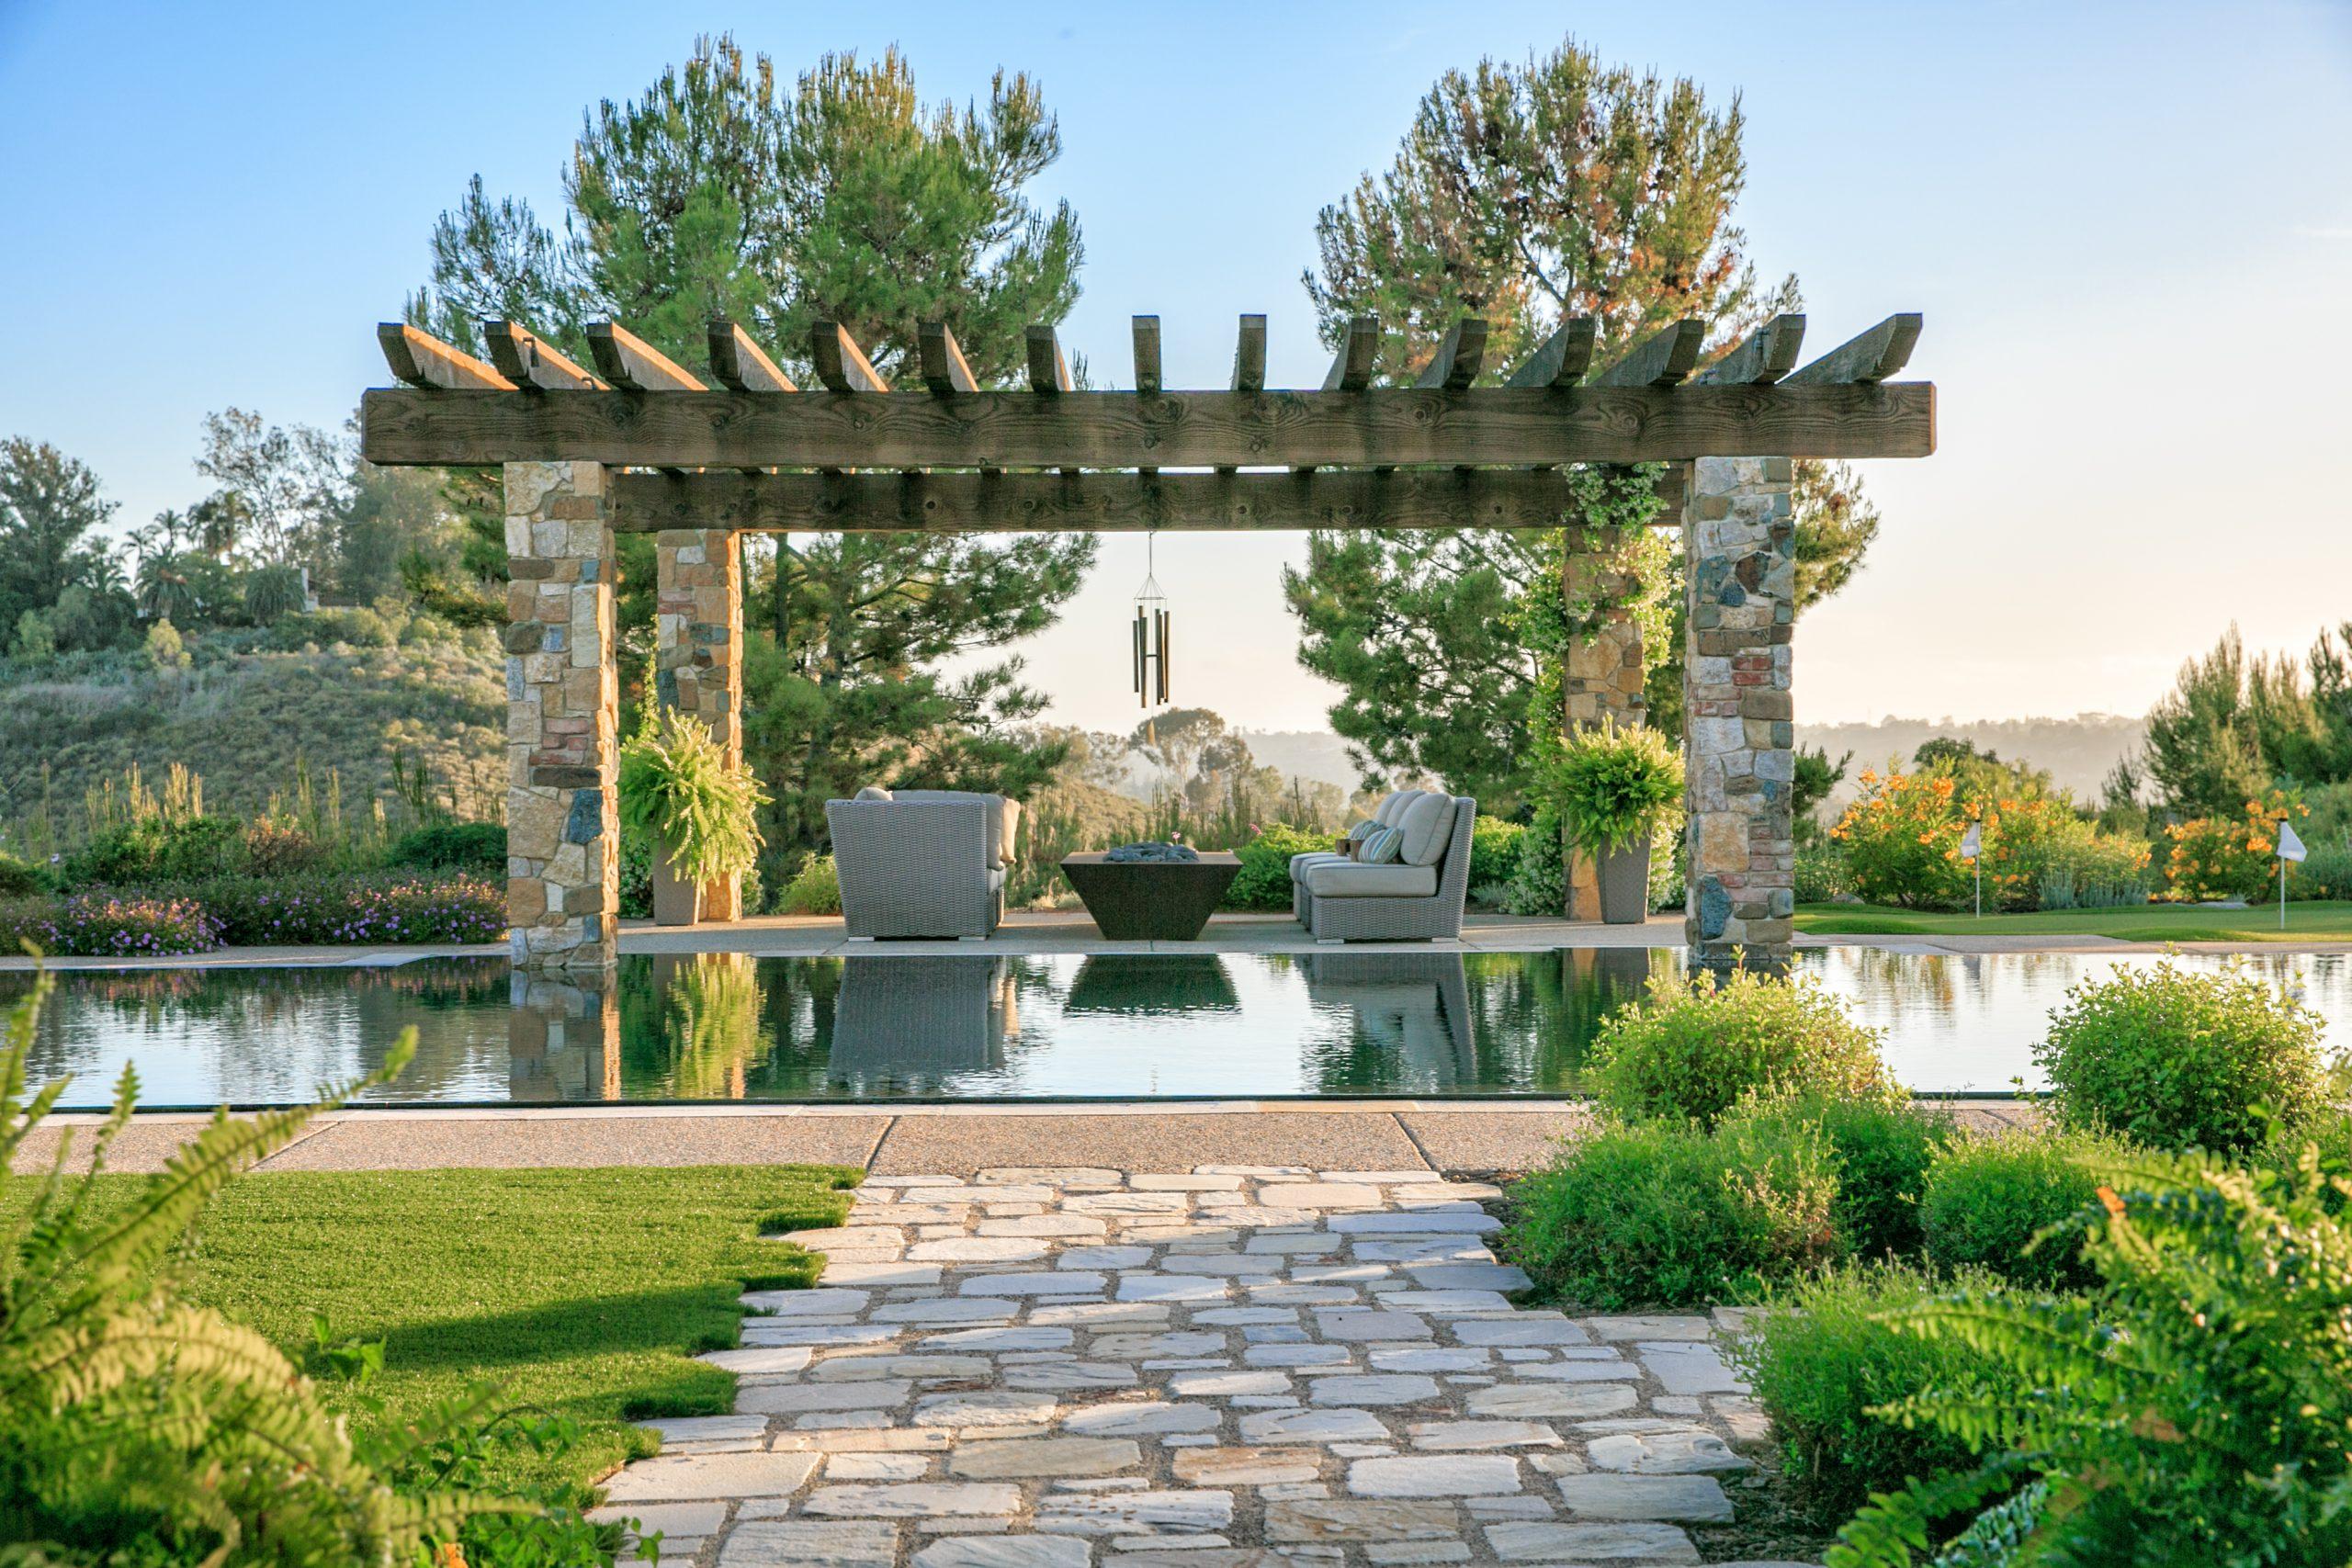 Italian Villa in Encinitas - Wynn-Smith Landascape Architecture